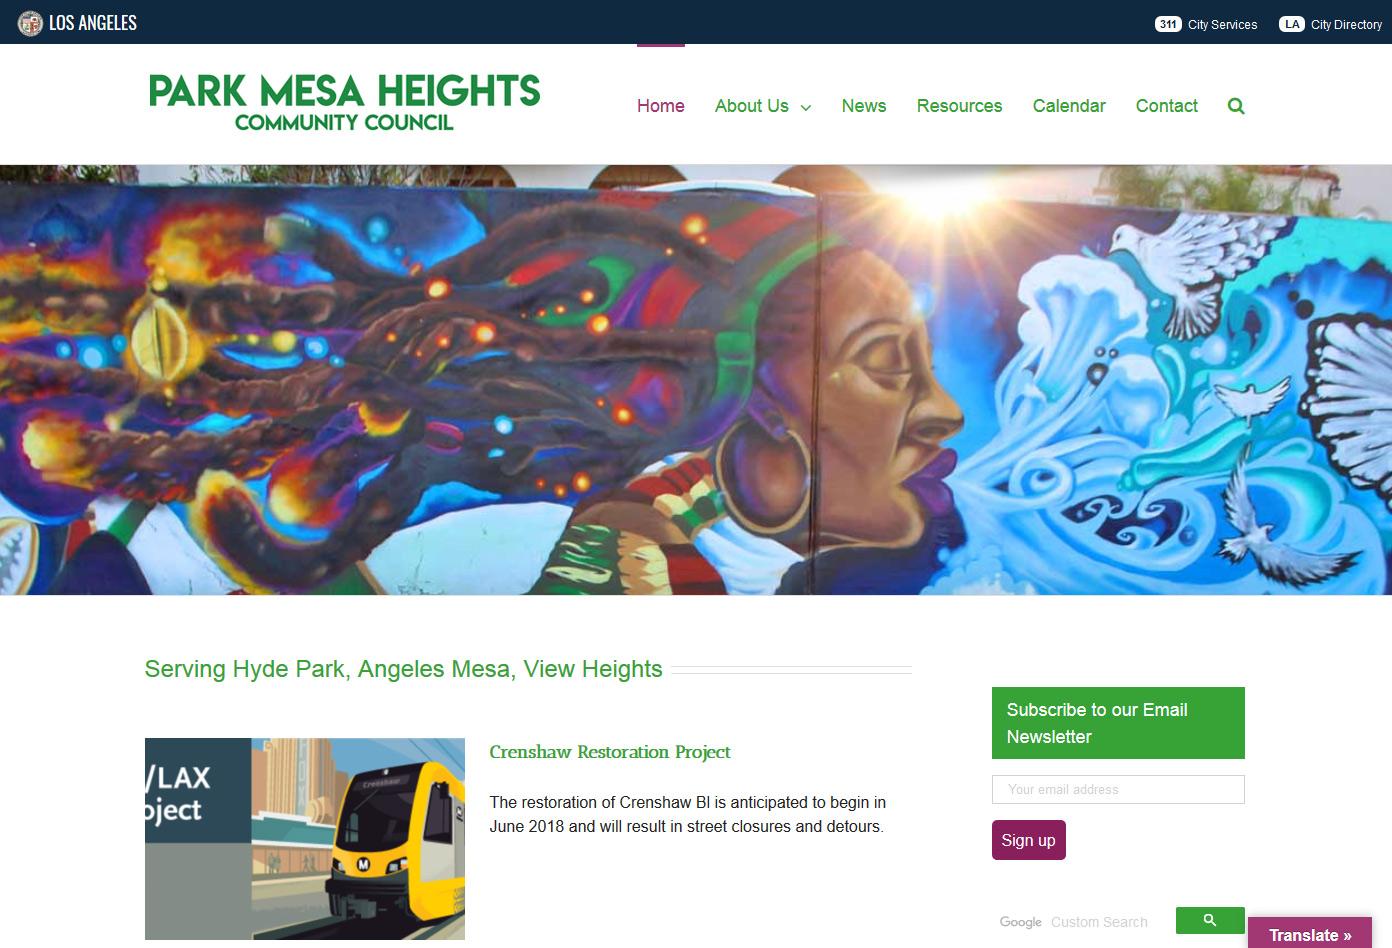 Park Mesa Heights Community Council Website